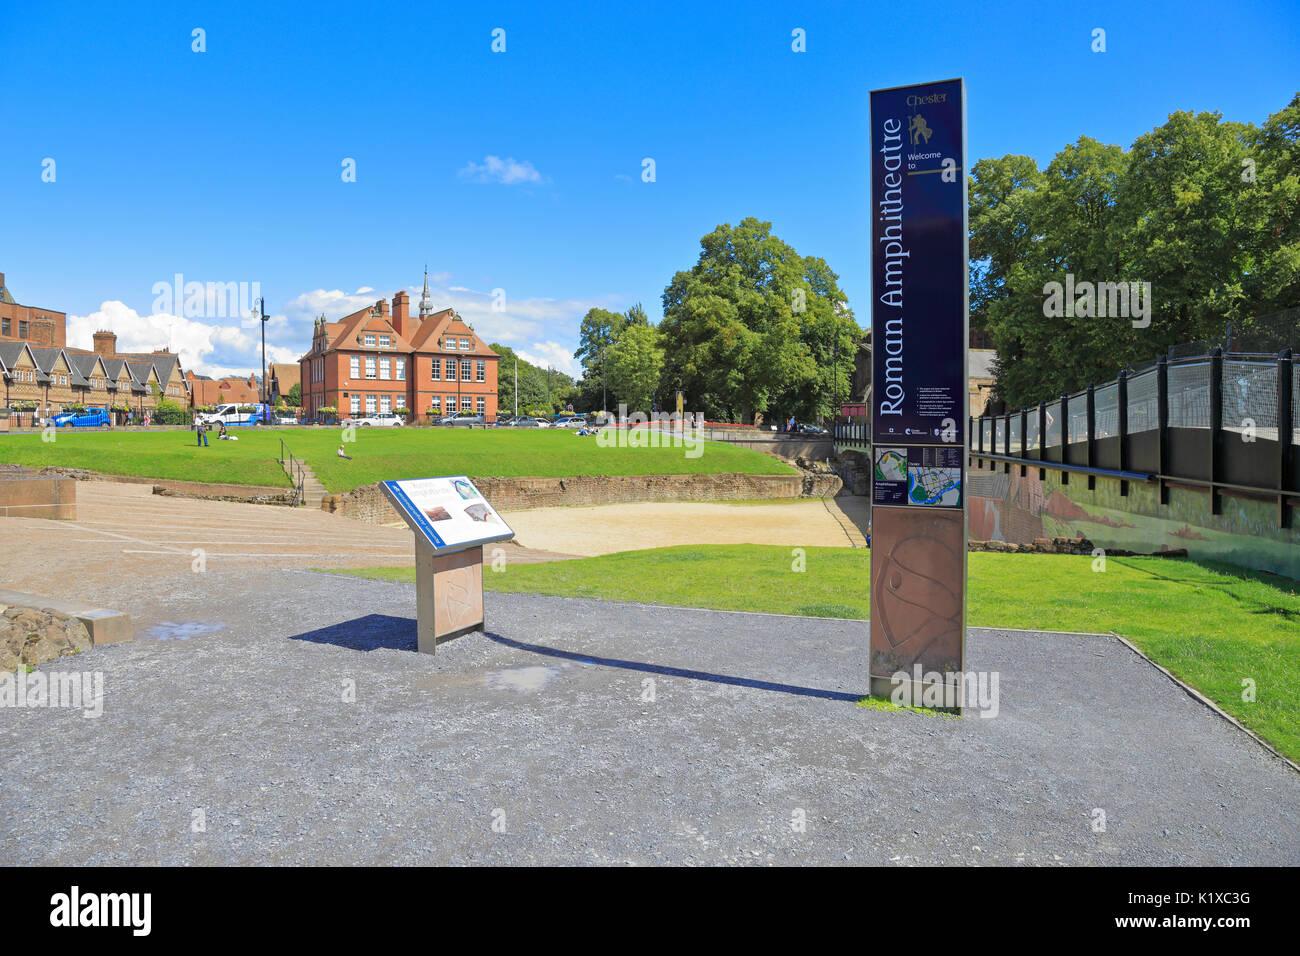 Roman amphitheatre interpretation boards, Chester, Cheshire, England, UK. - Stock Image